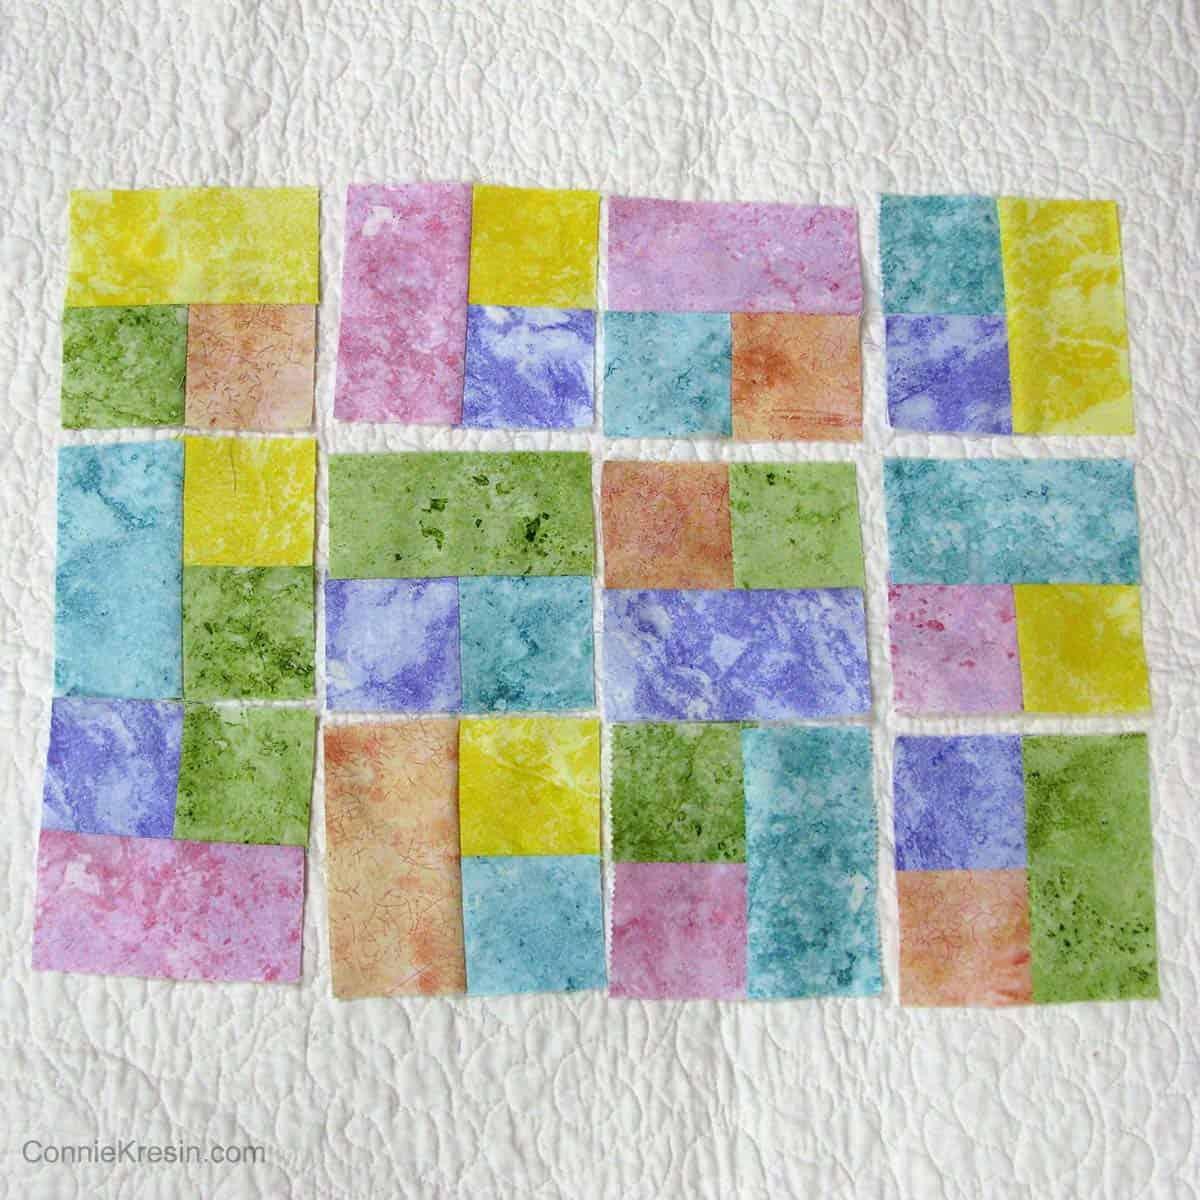 placemat blocks arranged